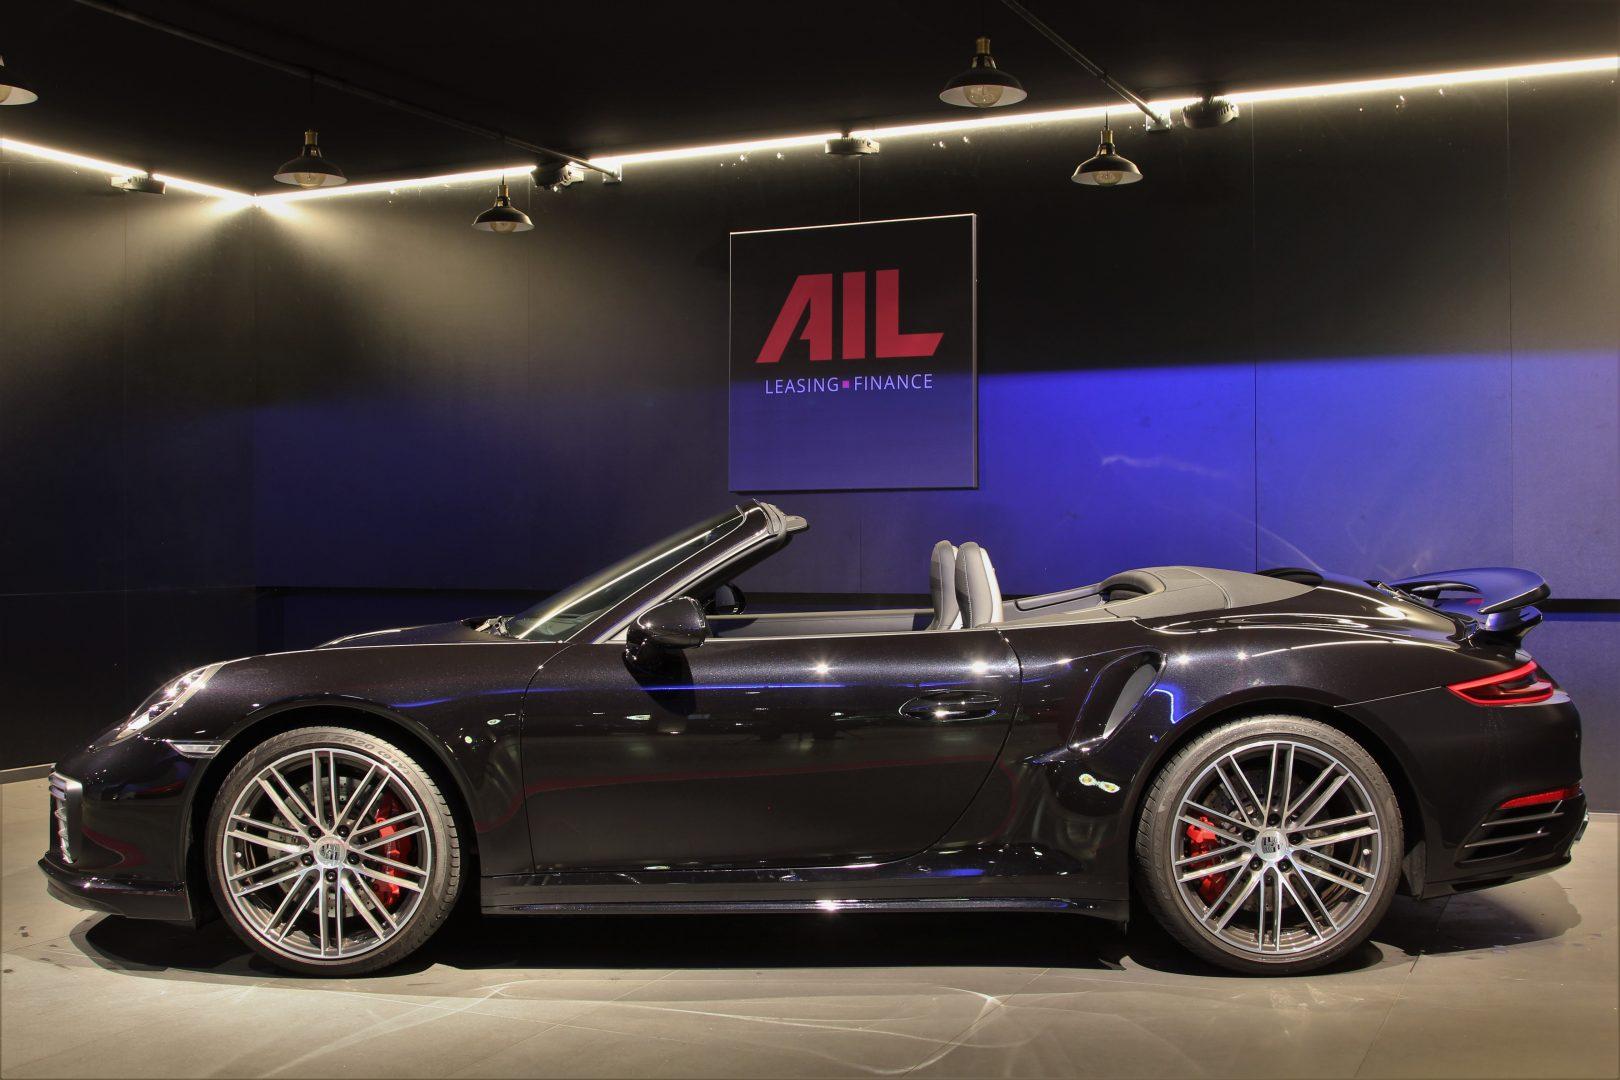 AIL Porsche 991 Turbo Lift LED DAB 5